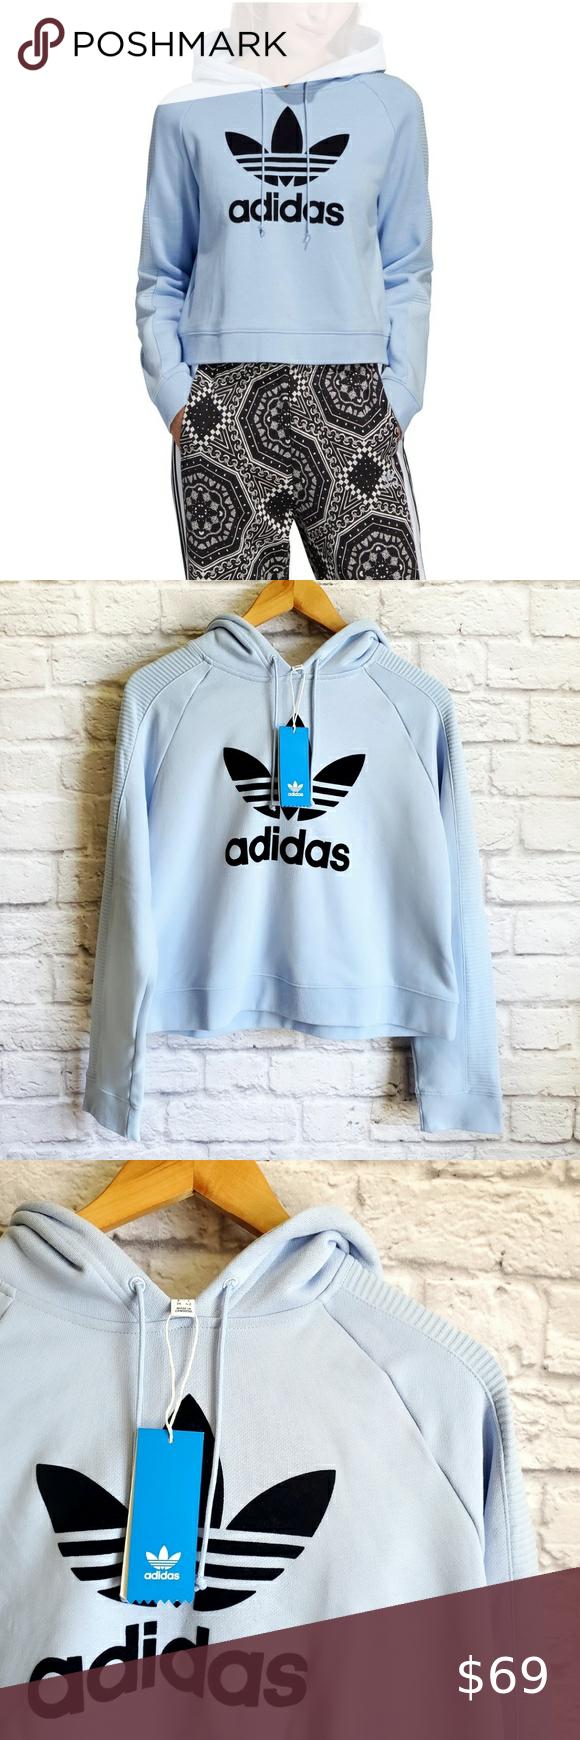 Adidas Crop Hoodie Light Blue Color Oversized Look Adidas Tops Sweatshirts Hoodies Adidas Cropped Hoodie Crop Hoodie Sweater Grey Adidas Hoodie [ 1740 x 580 Pixel ]